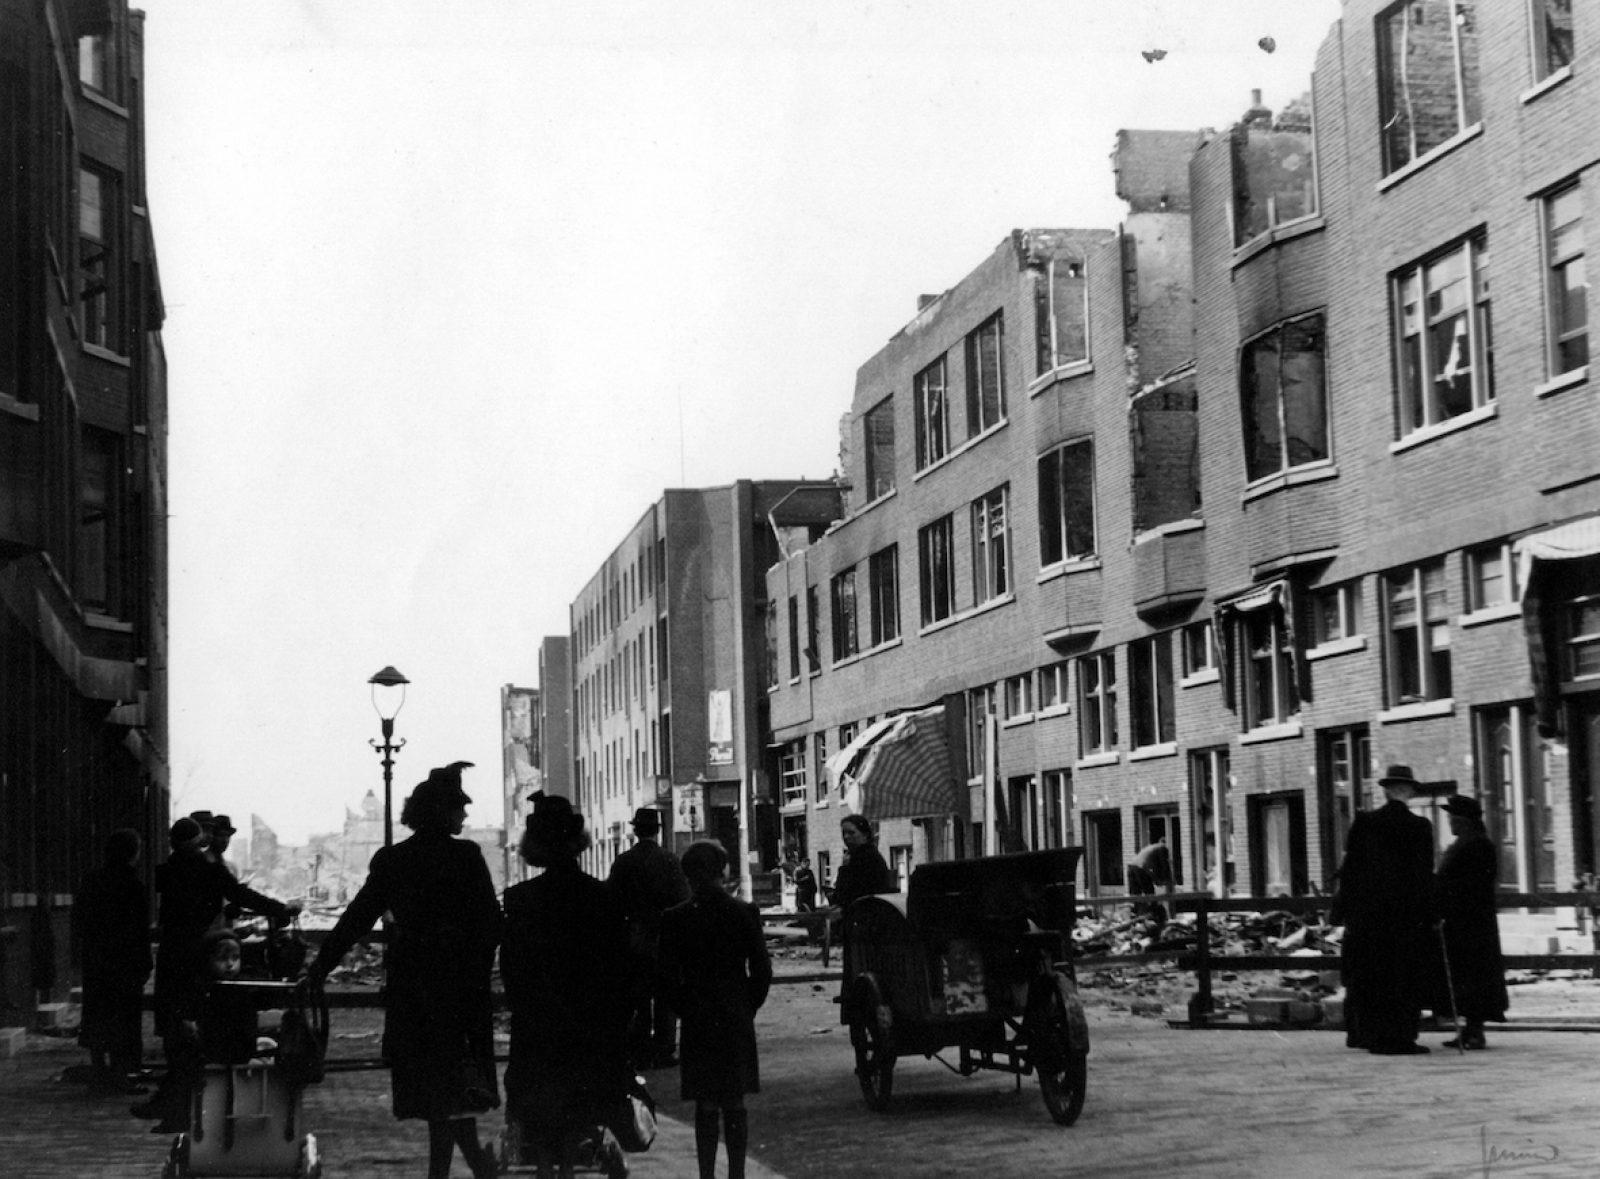 1943 04 Gijsingstraat Grimeyer NL Rt SA 4156 XXXIII 632 00 03 1 01